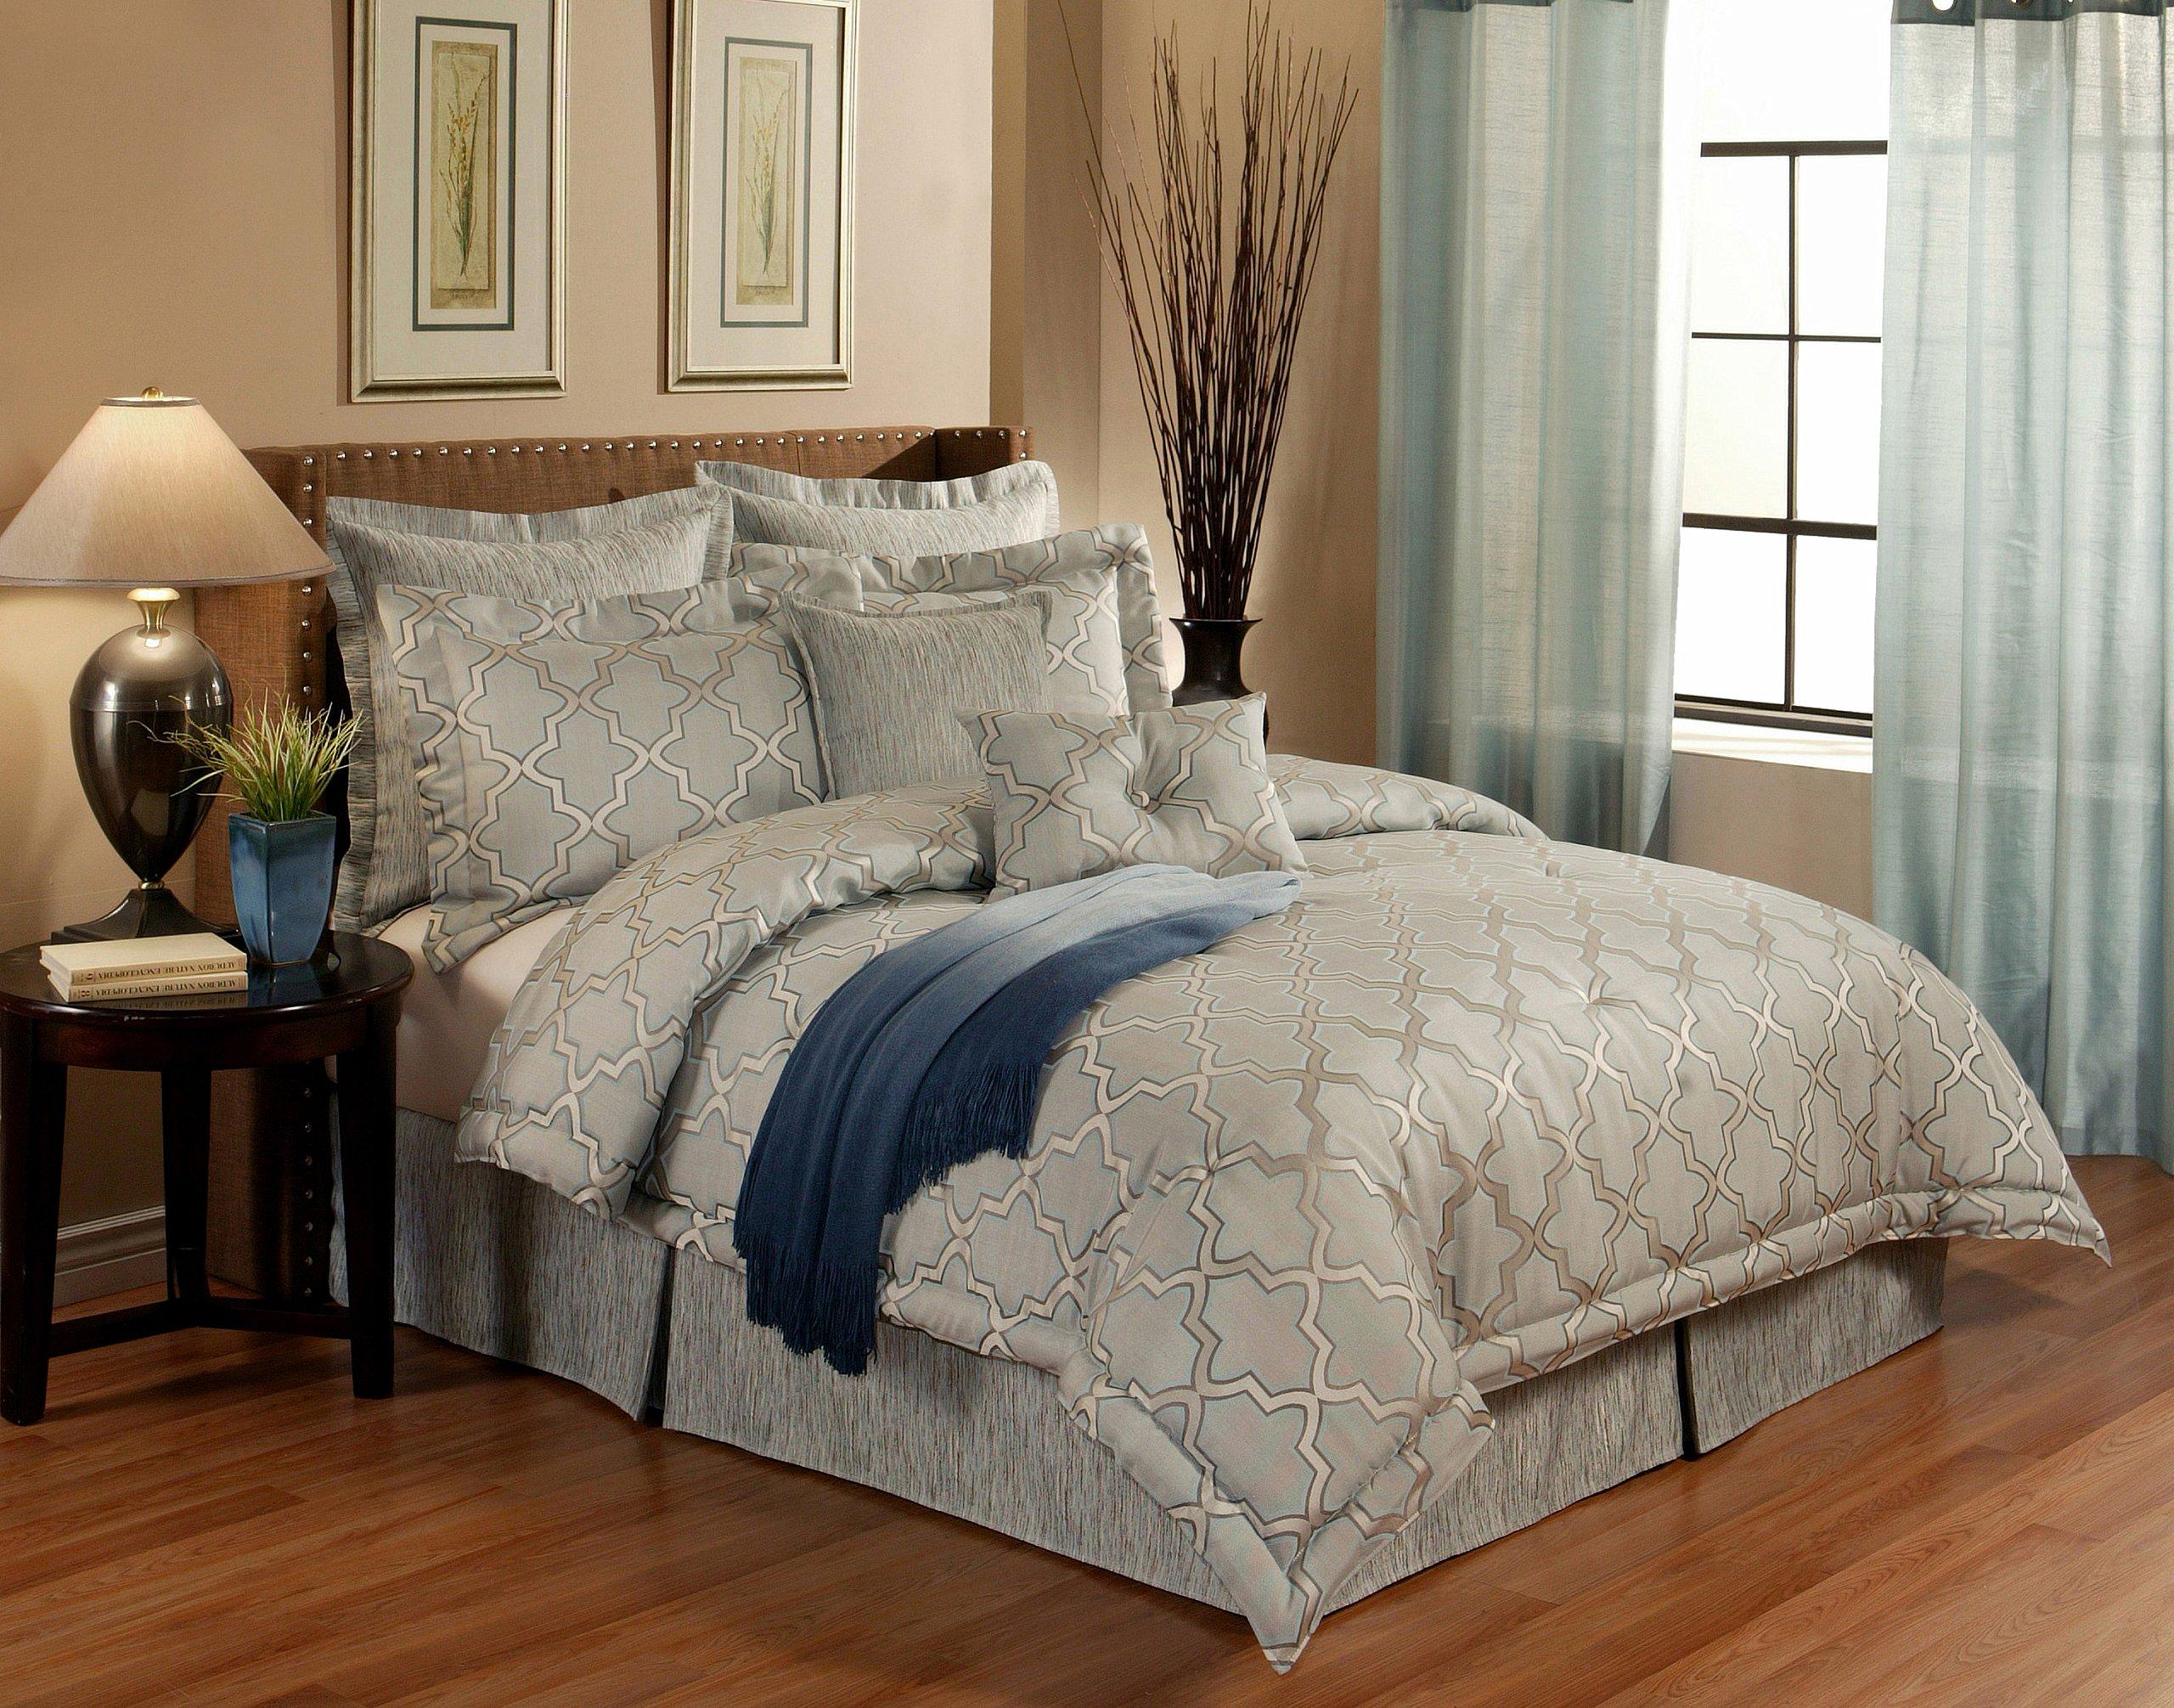 Austin Horn En' Vogue 4 piece Glamour Comforter Set, Queen, Spa Blue